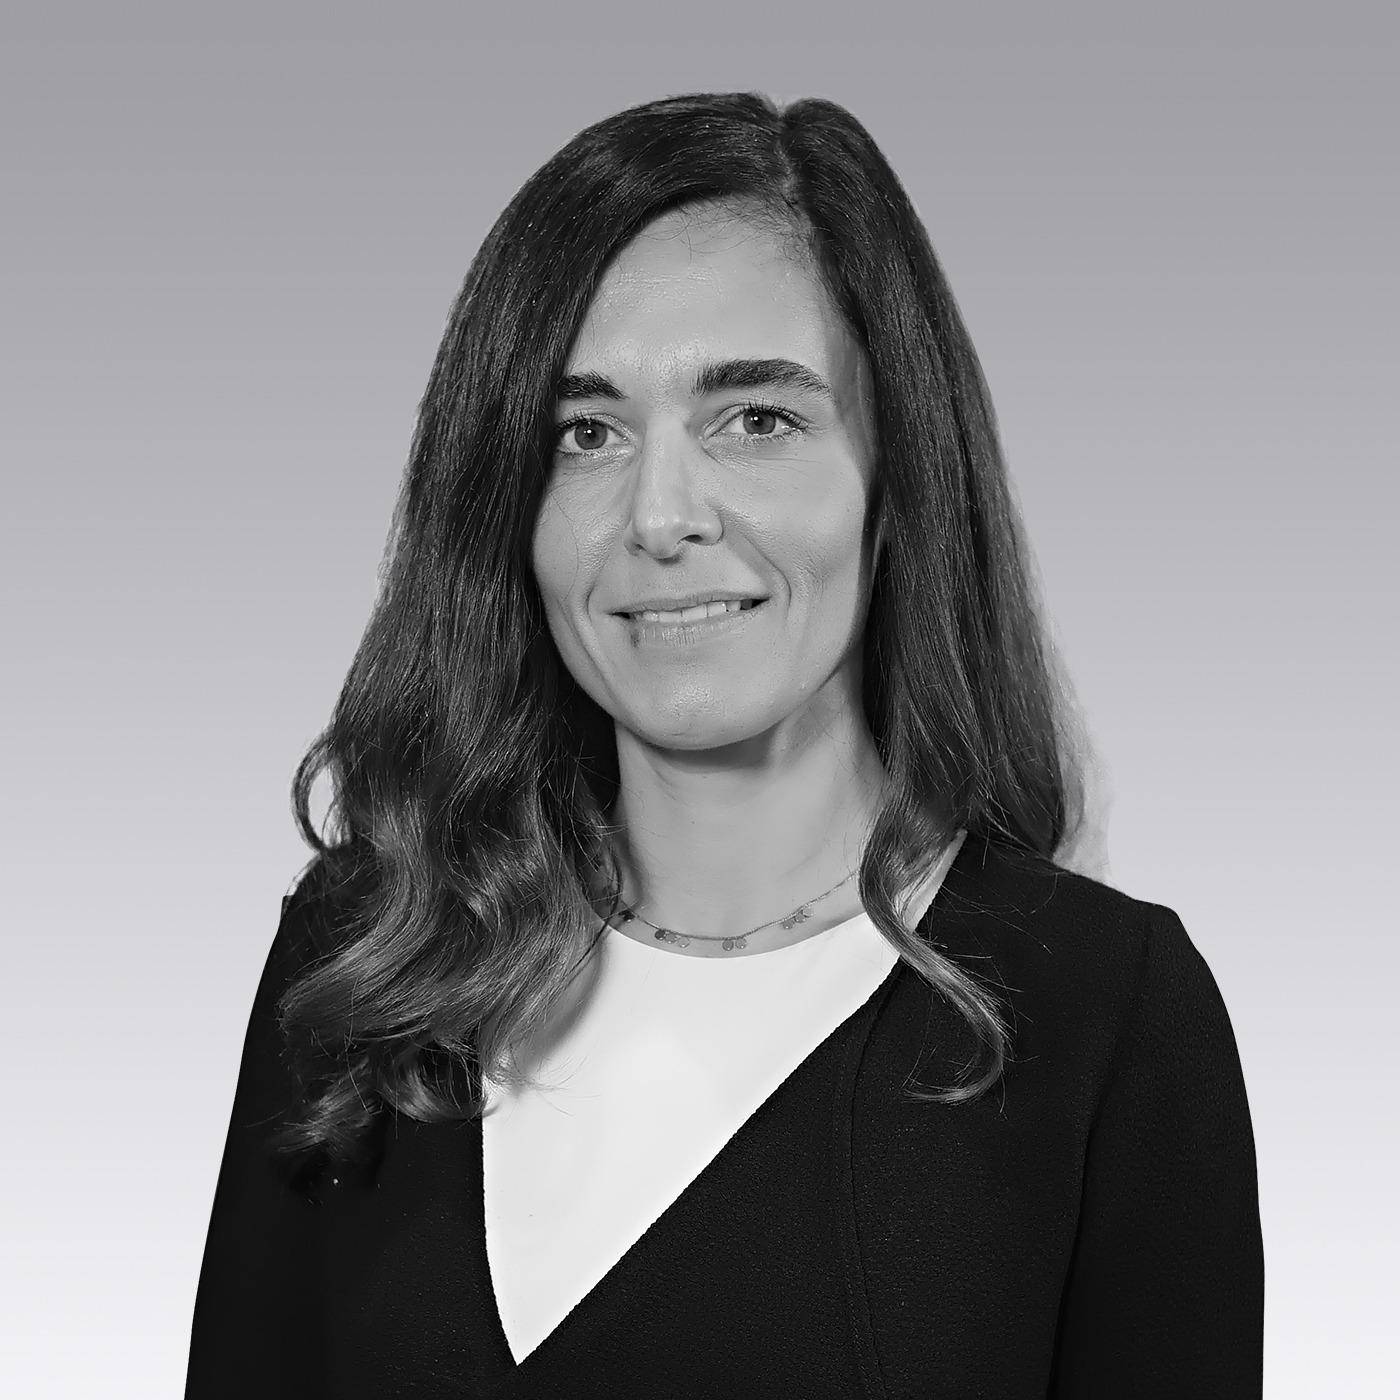 Julie Perlier